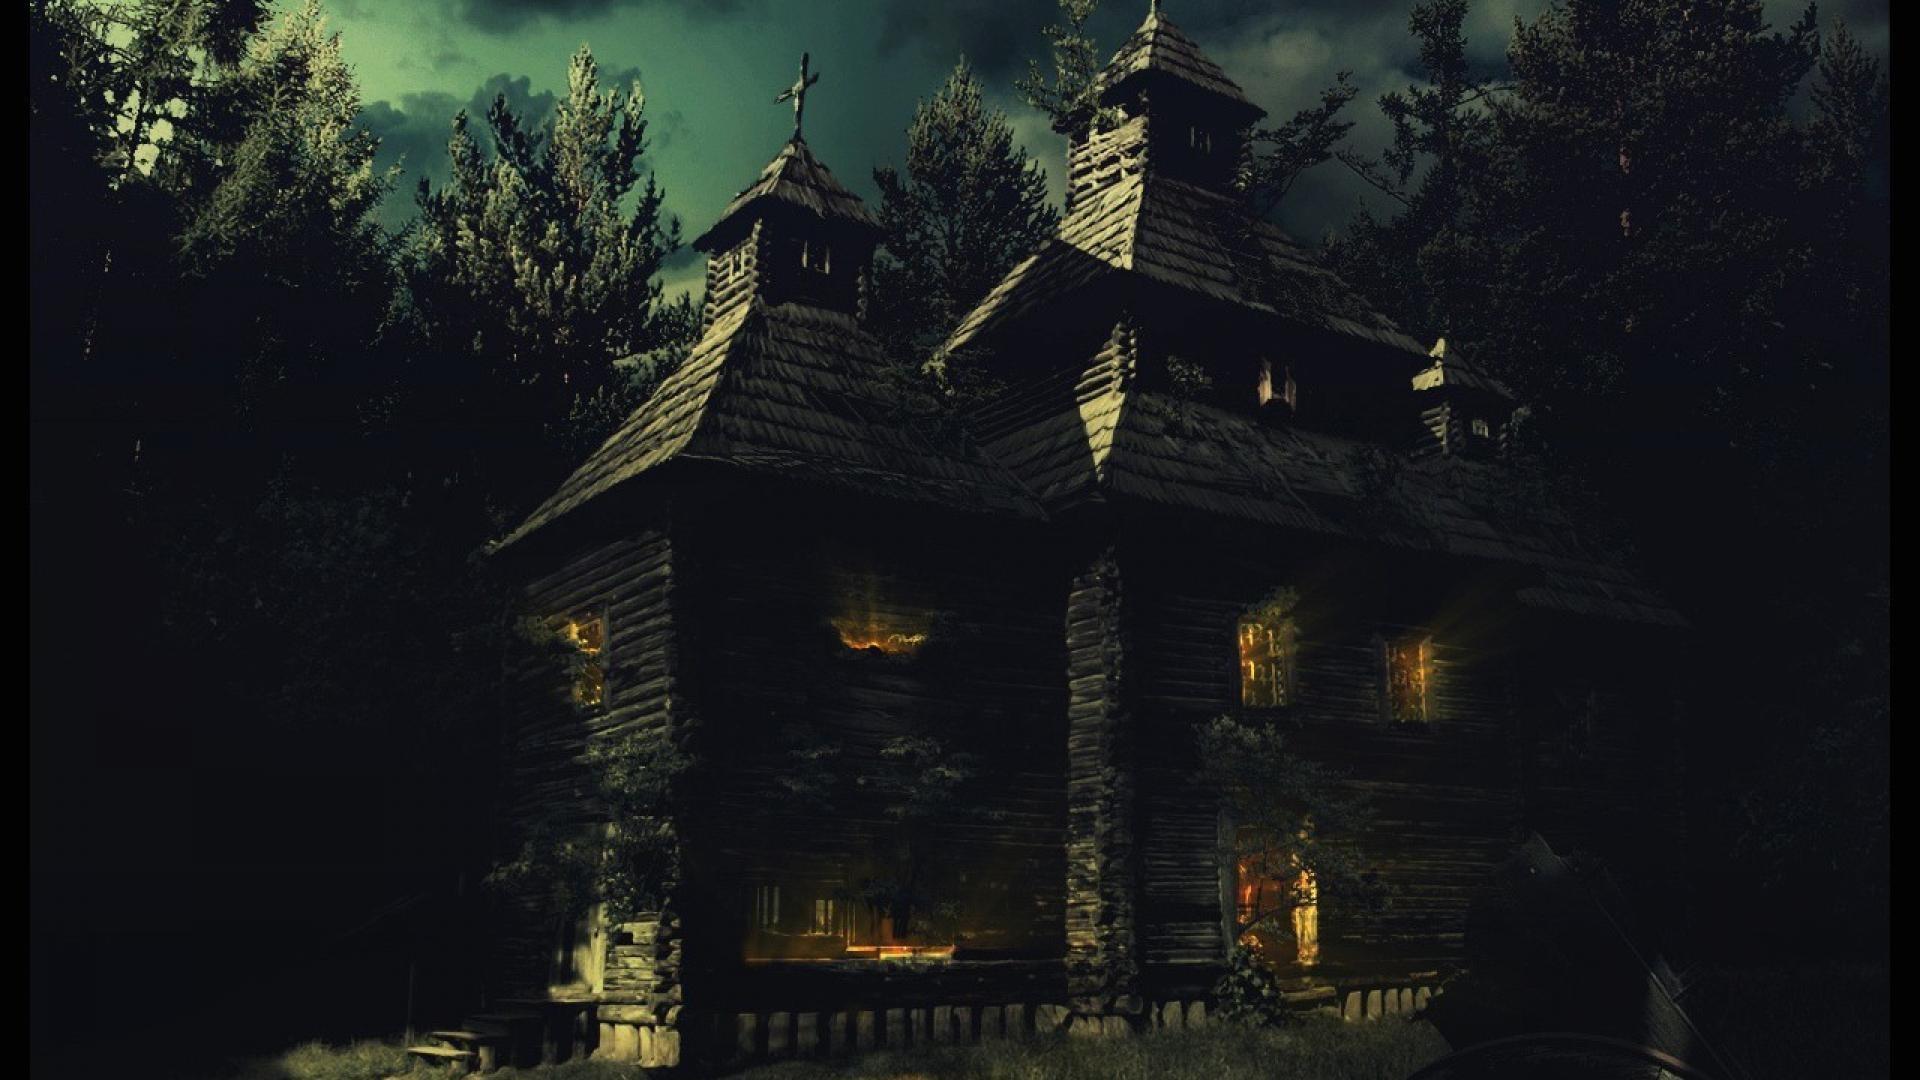 Wonderful Wallpaper Halloween Home Screen - 479325  Snapshot_434617.jpg